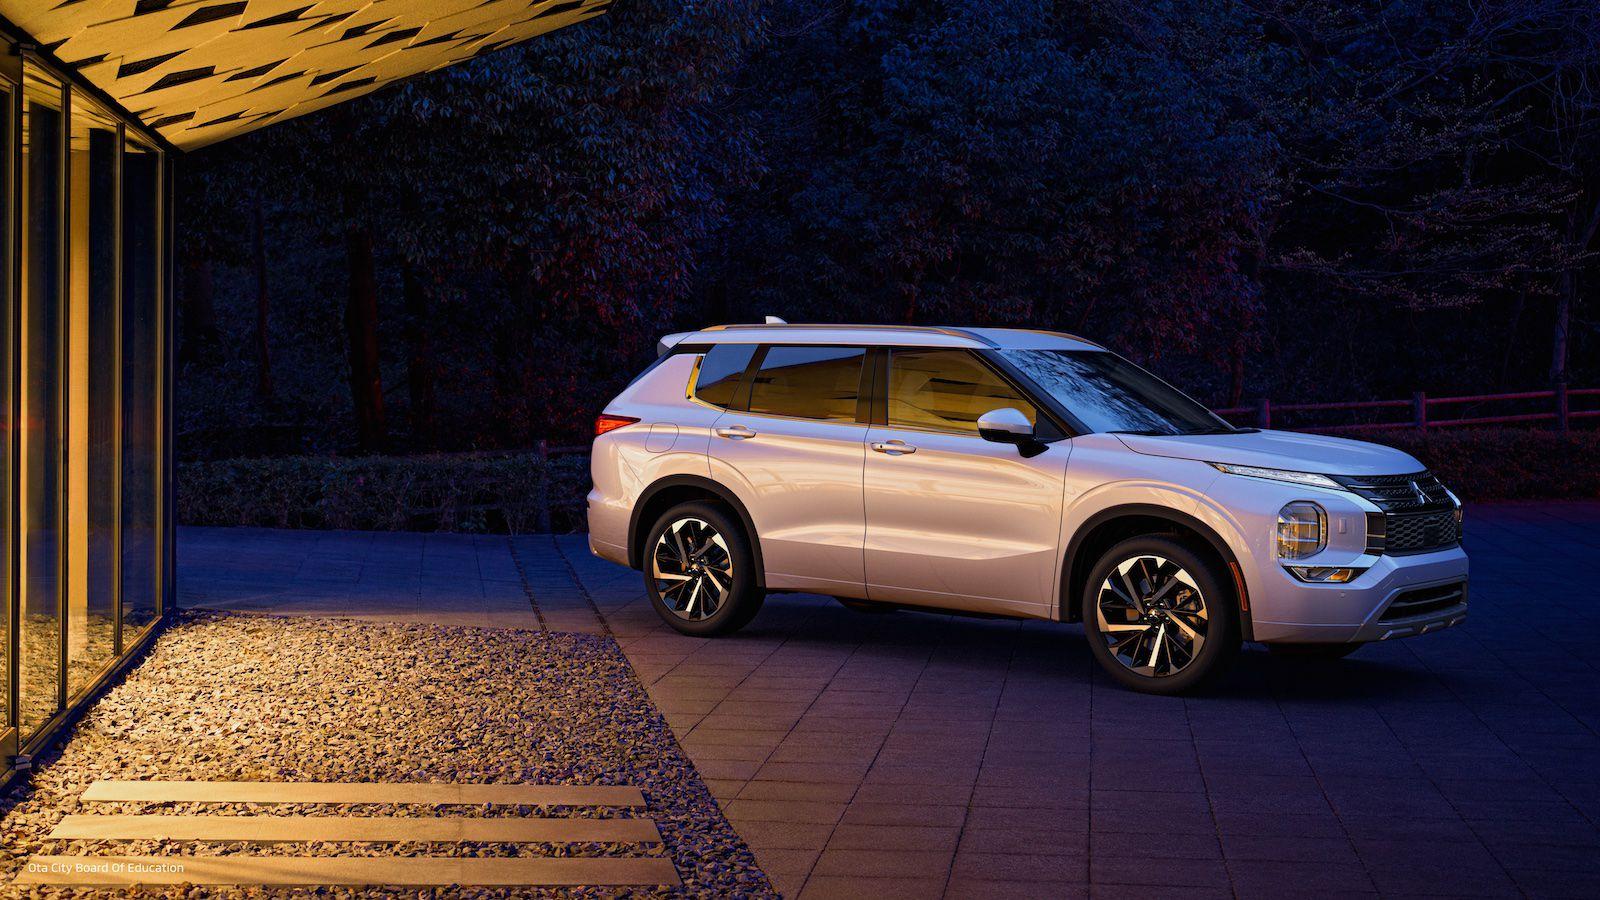 Mitsubishi Begins Adopting Wireless CarPlay